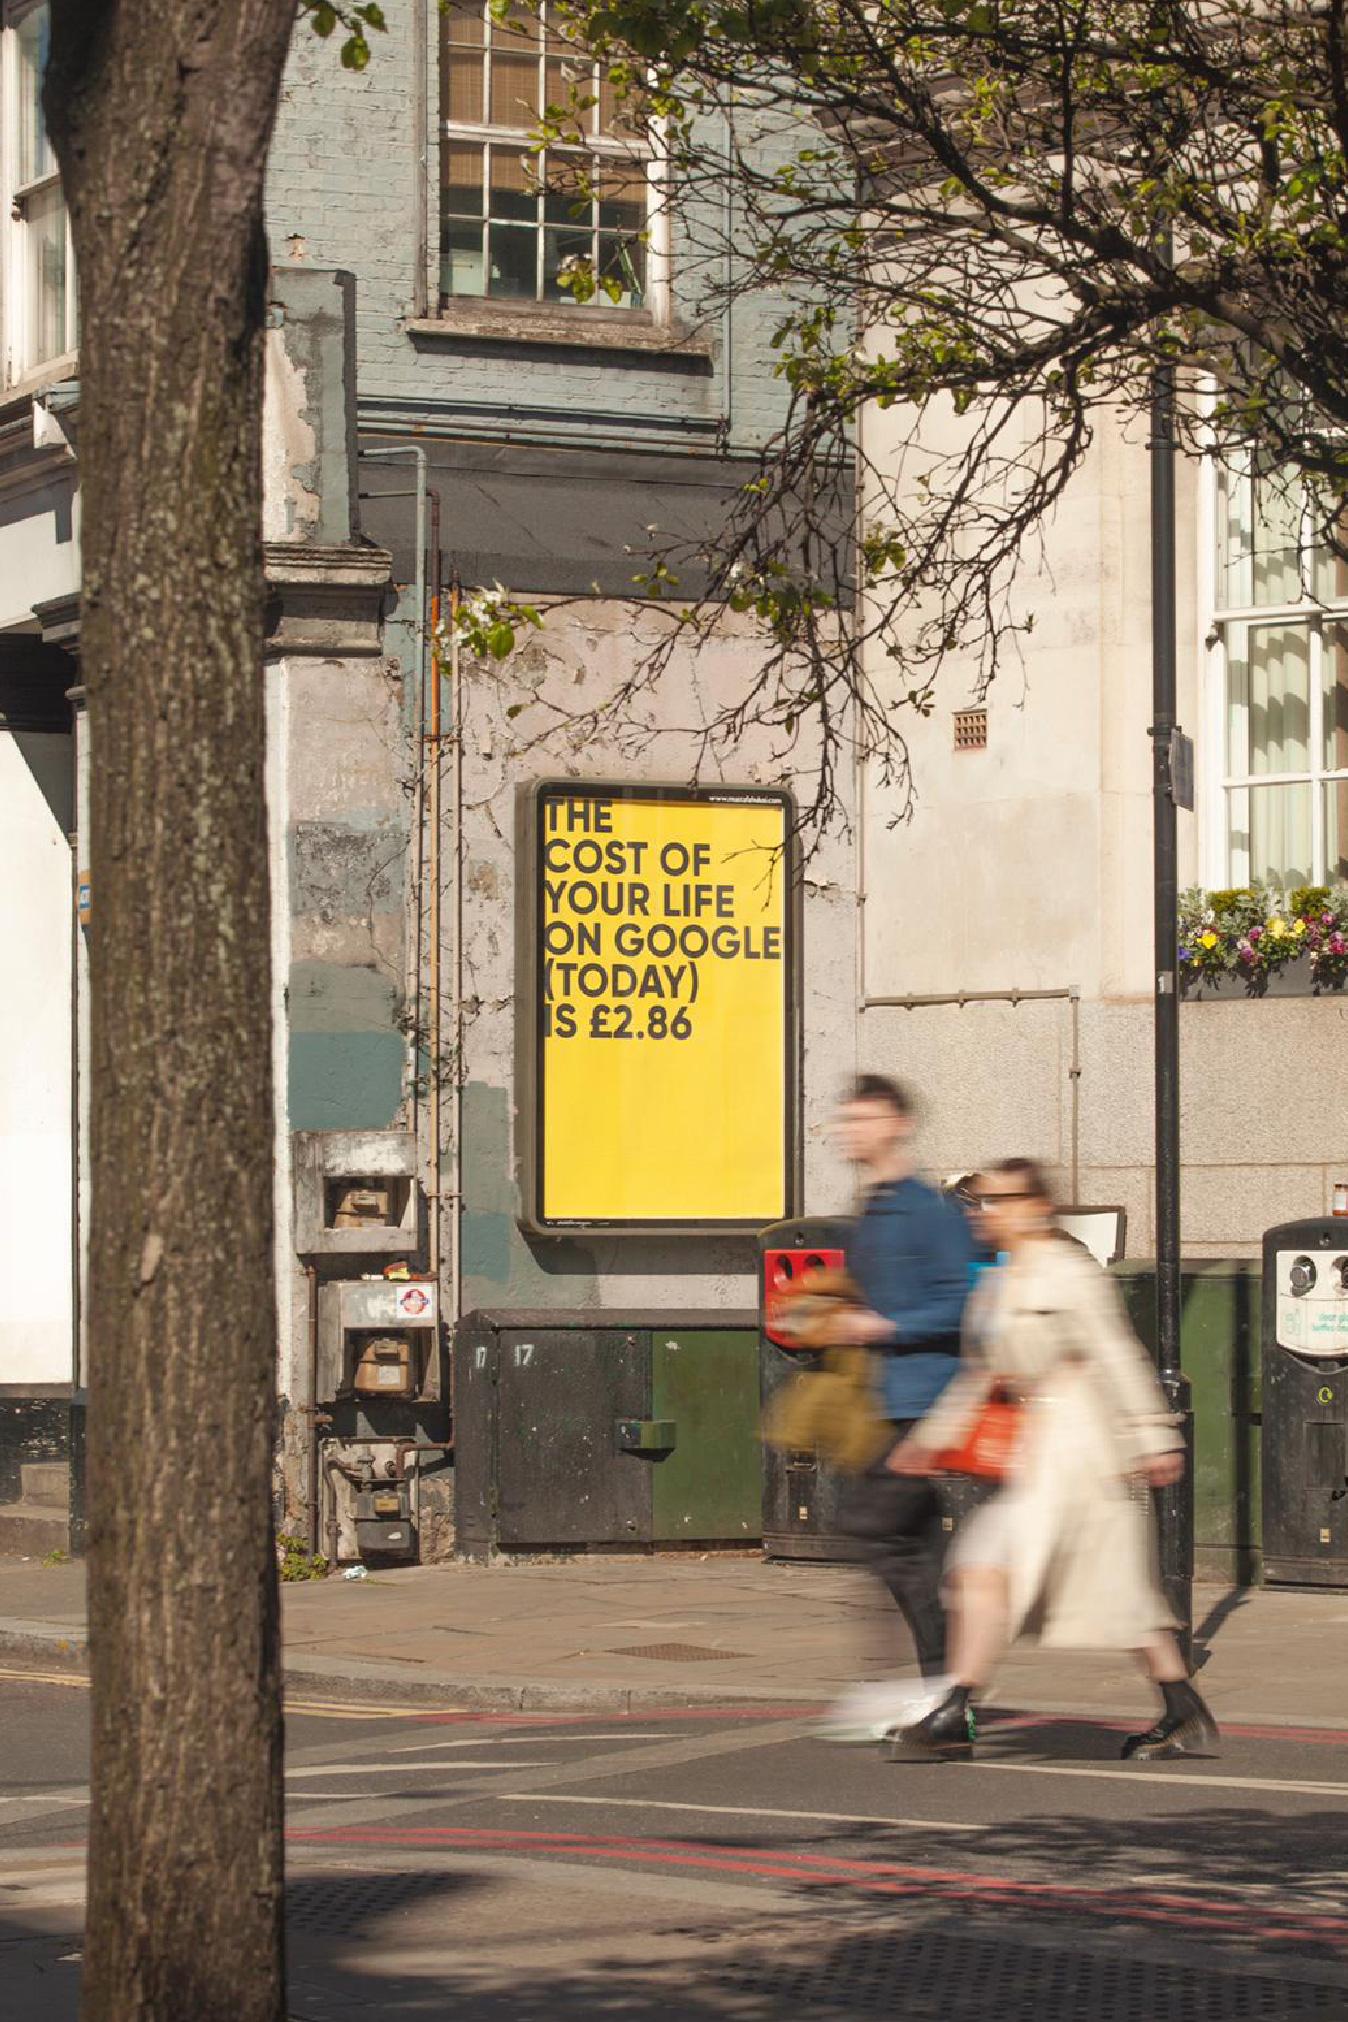 The Cost of Your Life on Google, by Fabio Lattanzi Antinori, Public Artwork, Installation view, Old Street, London 2021